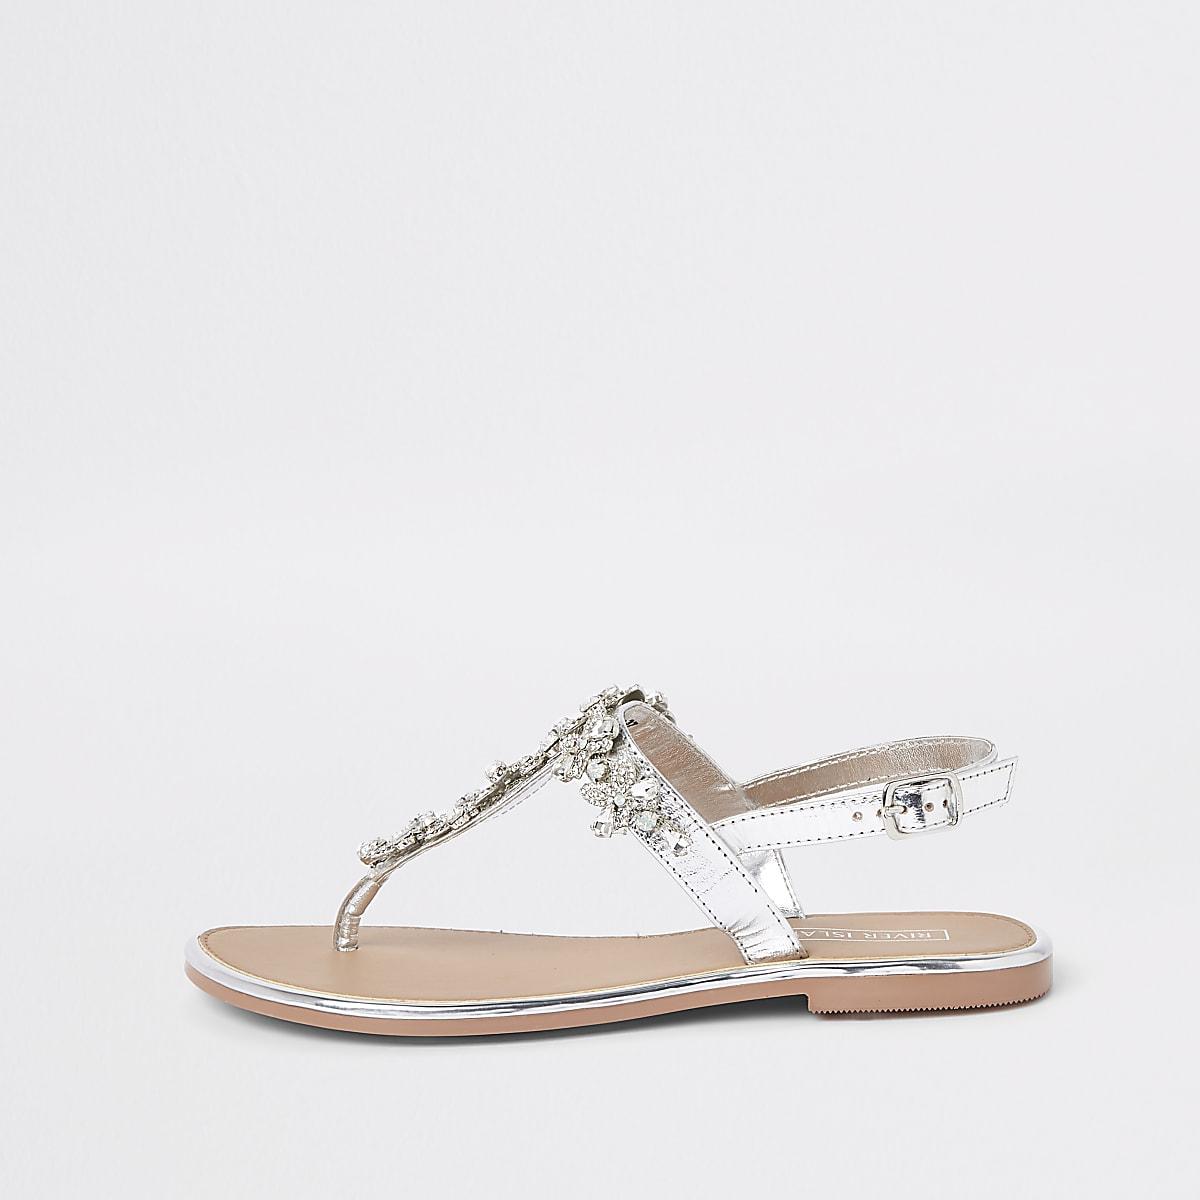 408d2dec0 Silver leather jewel embellished flat sandals - Sandals - Shoes   Boots -  women